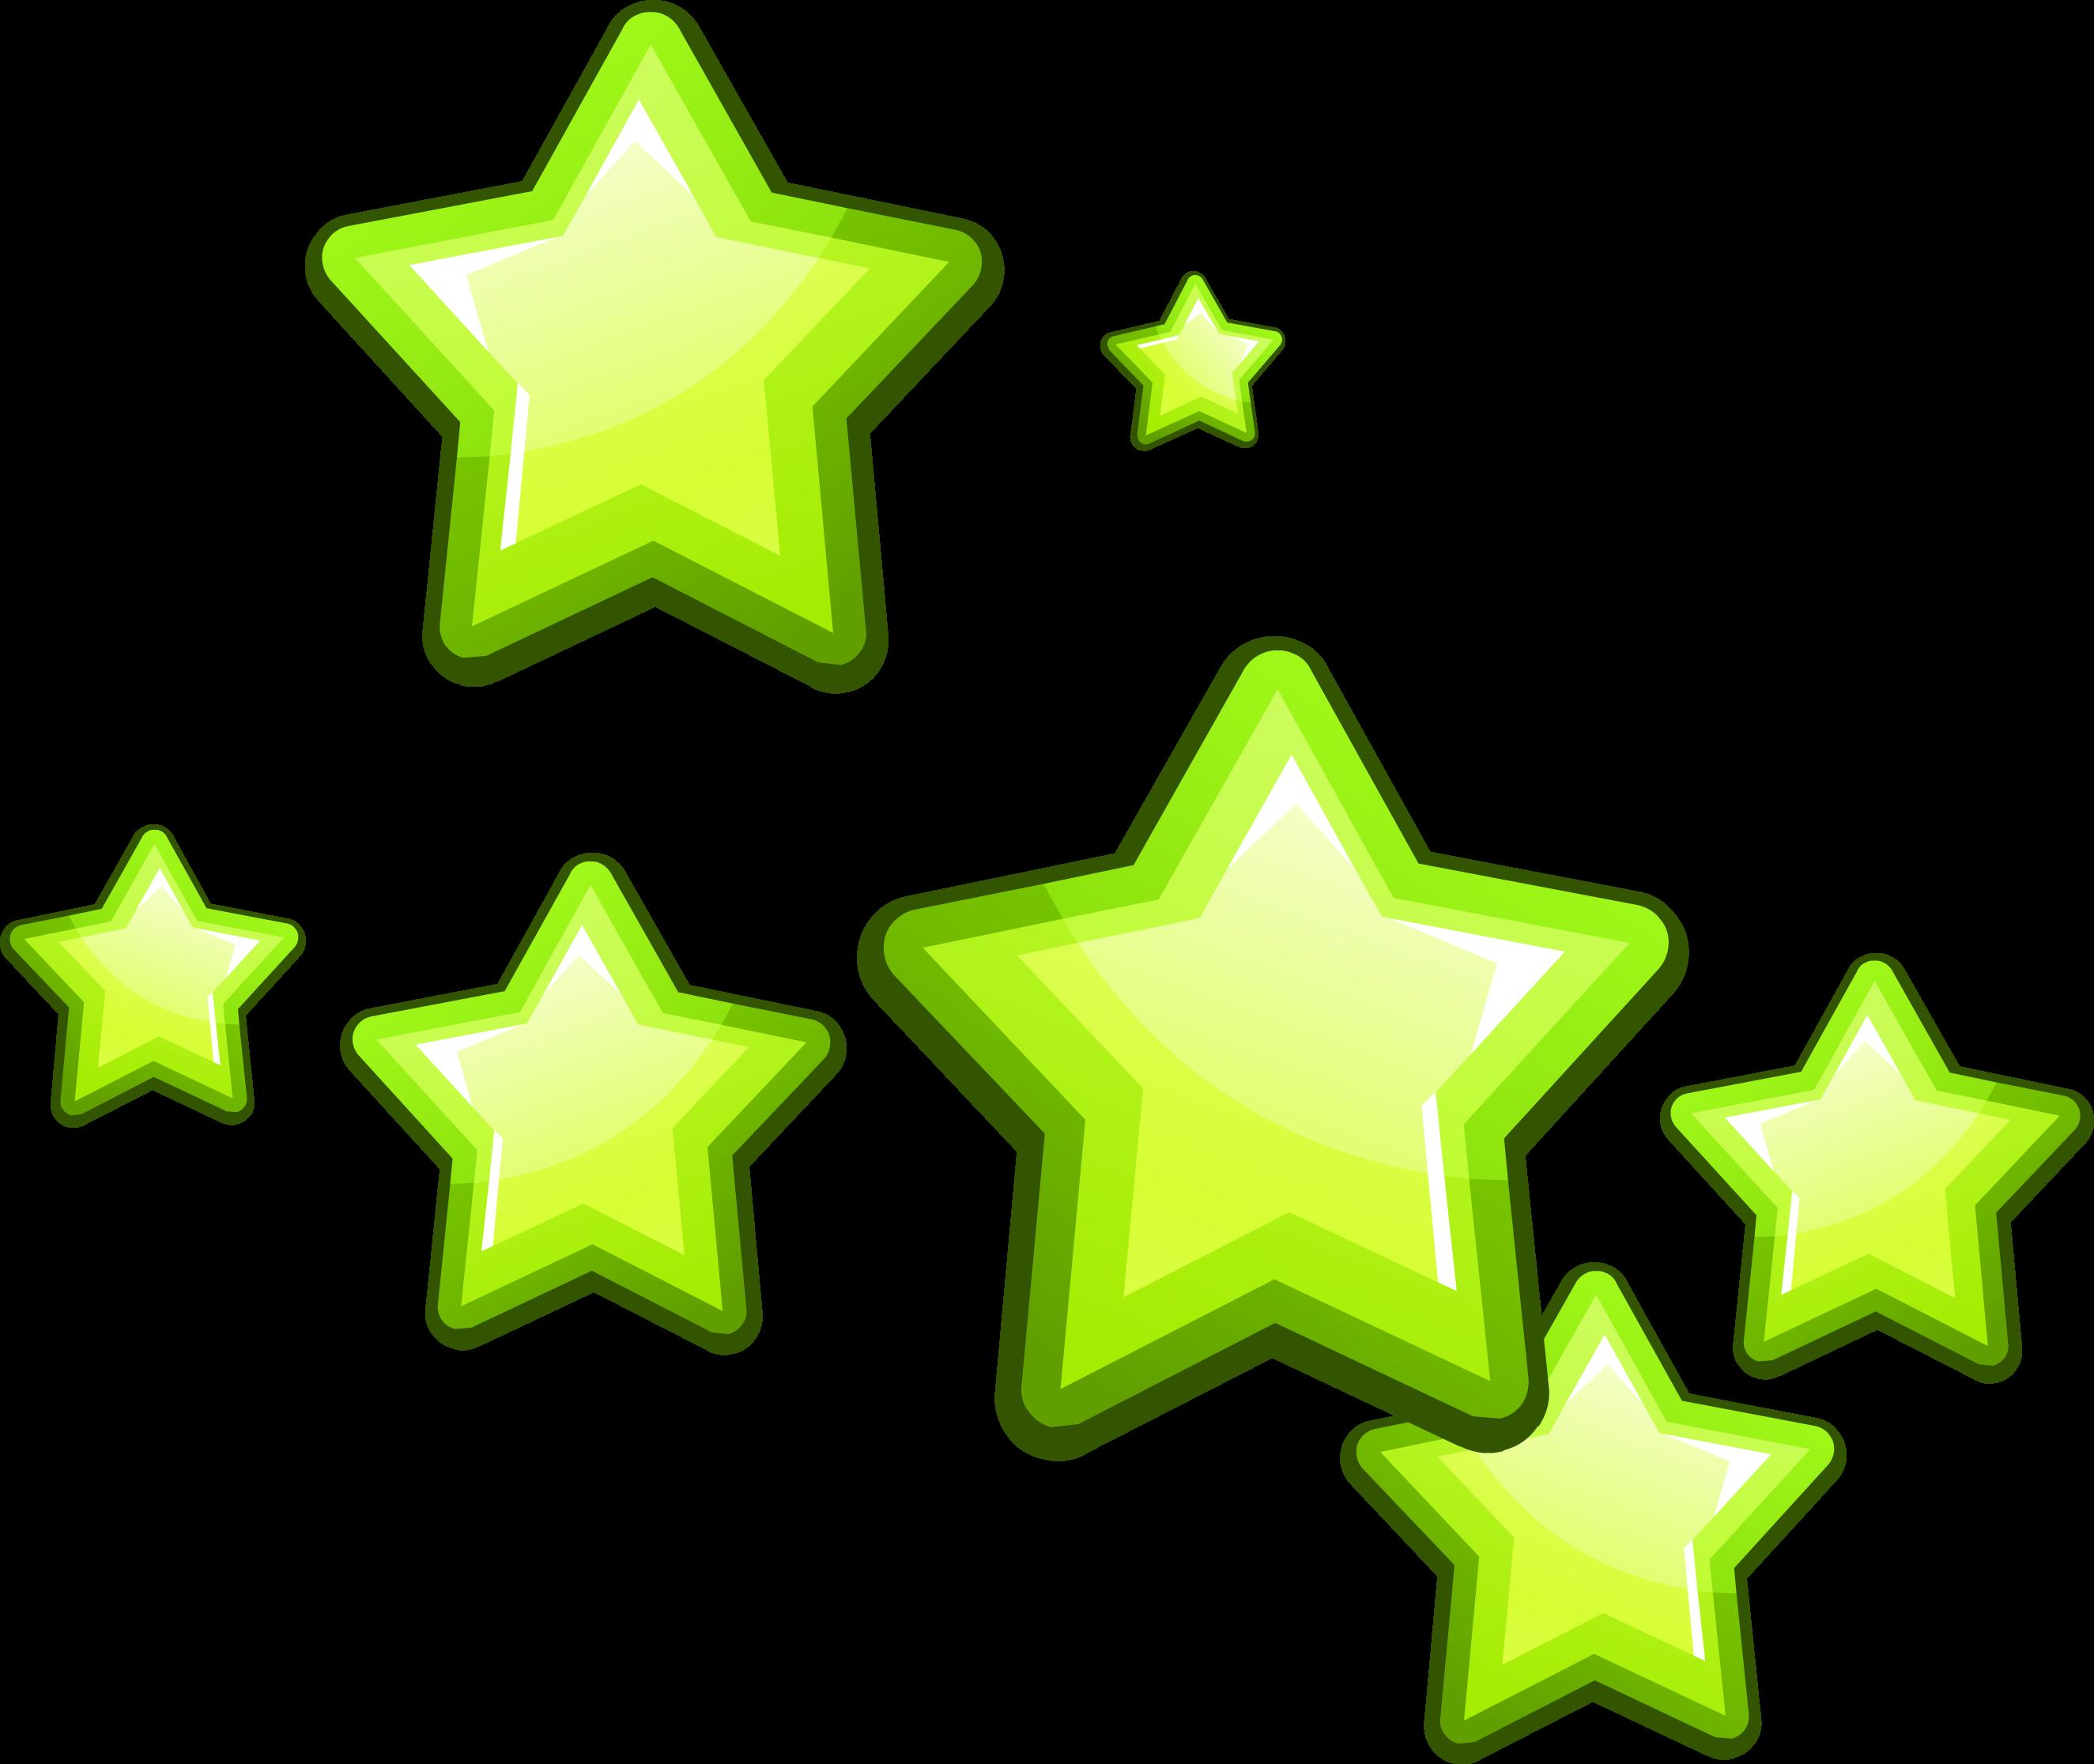 Картинки в пнг звездочки